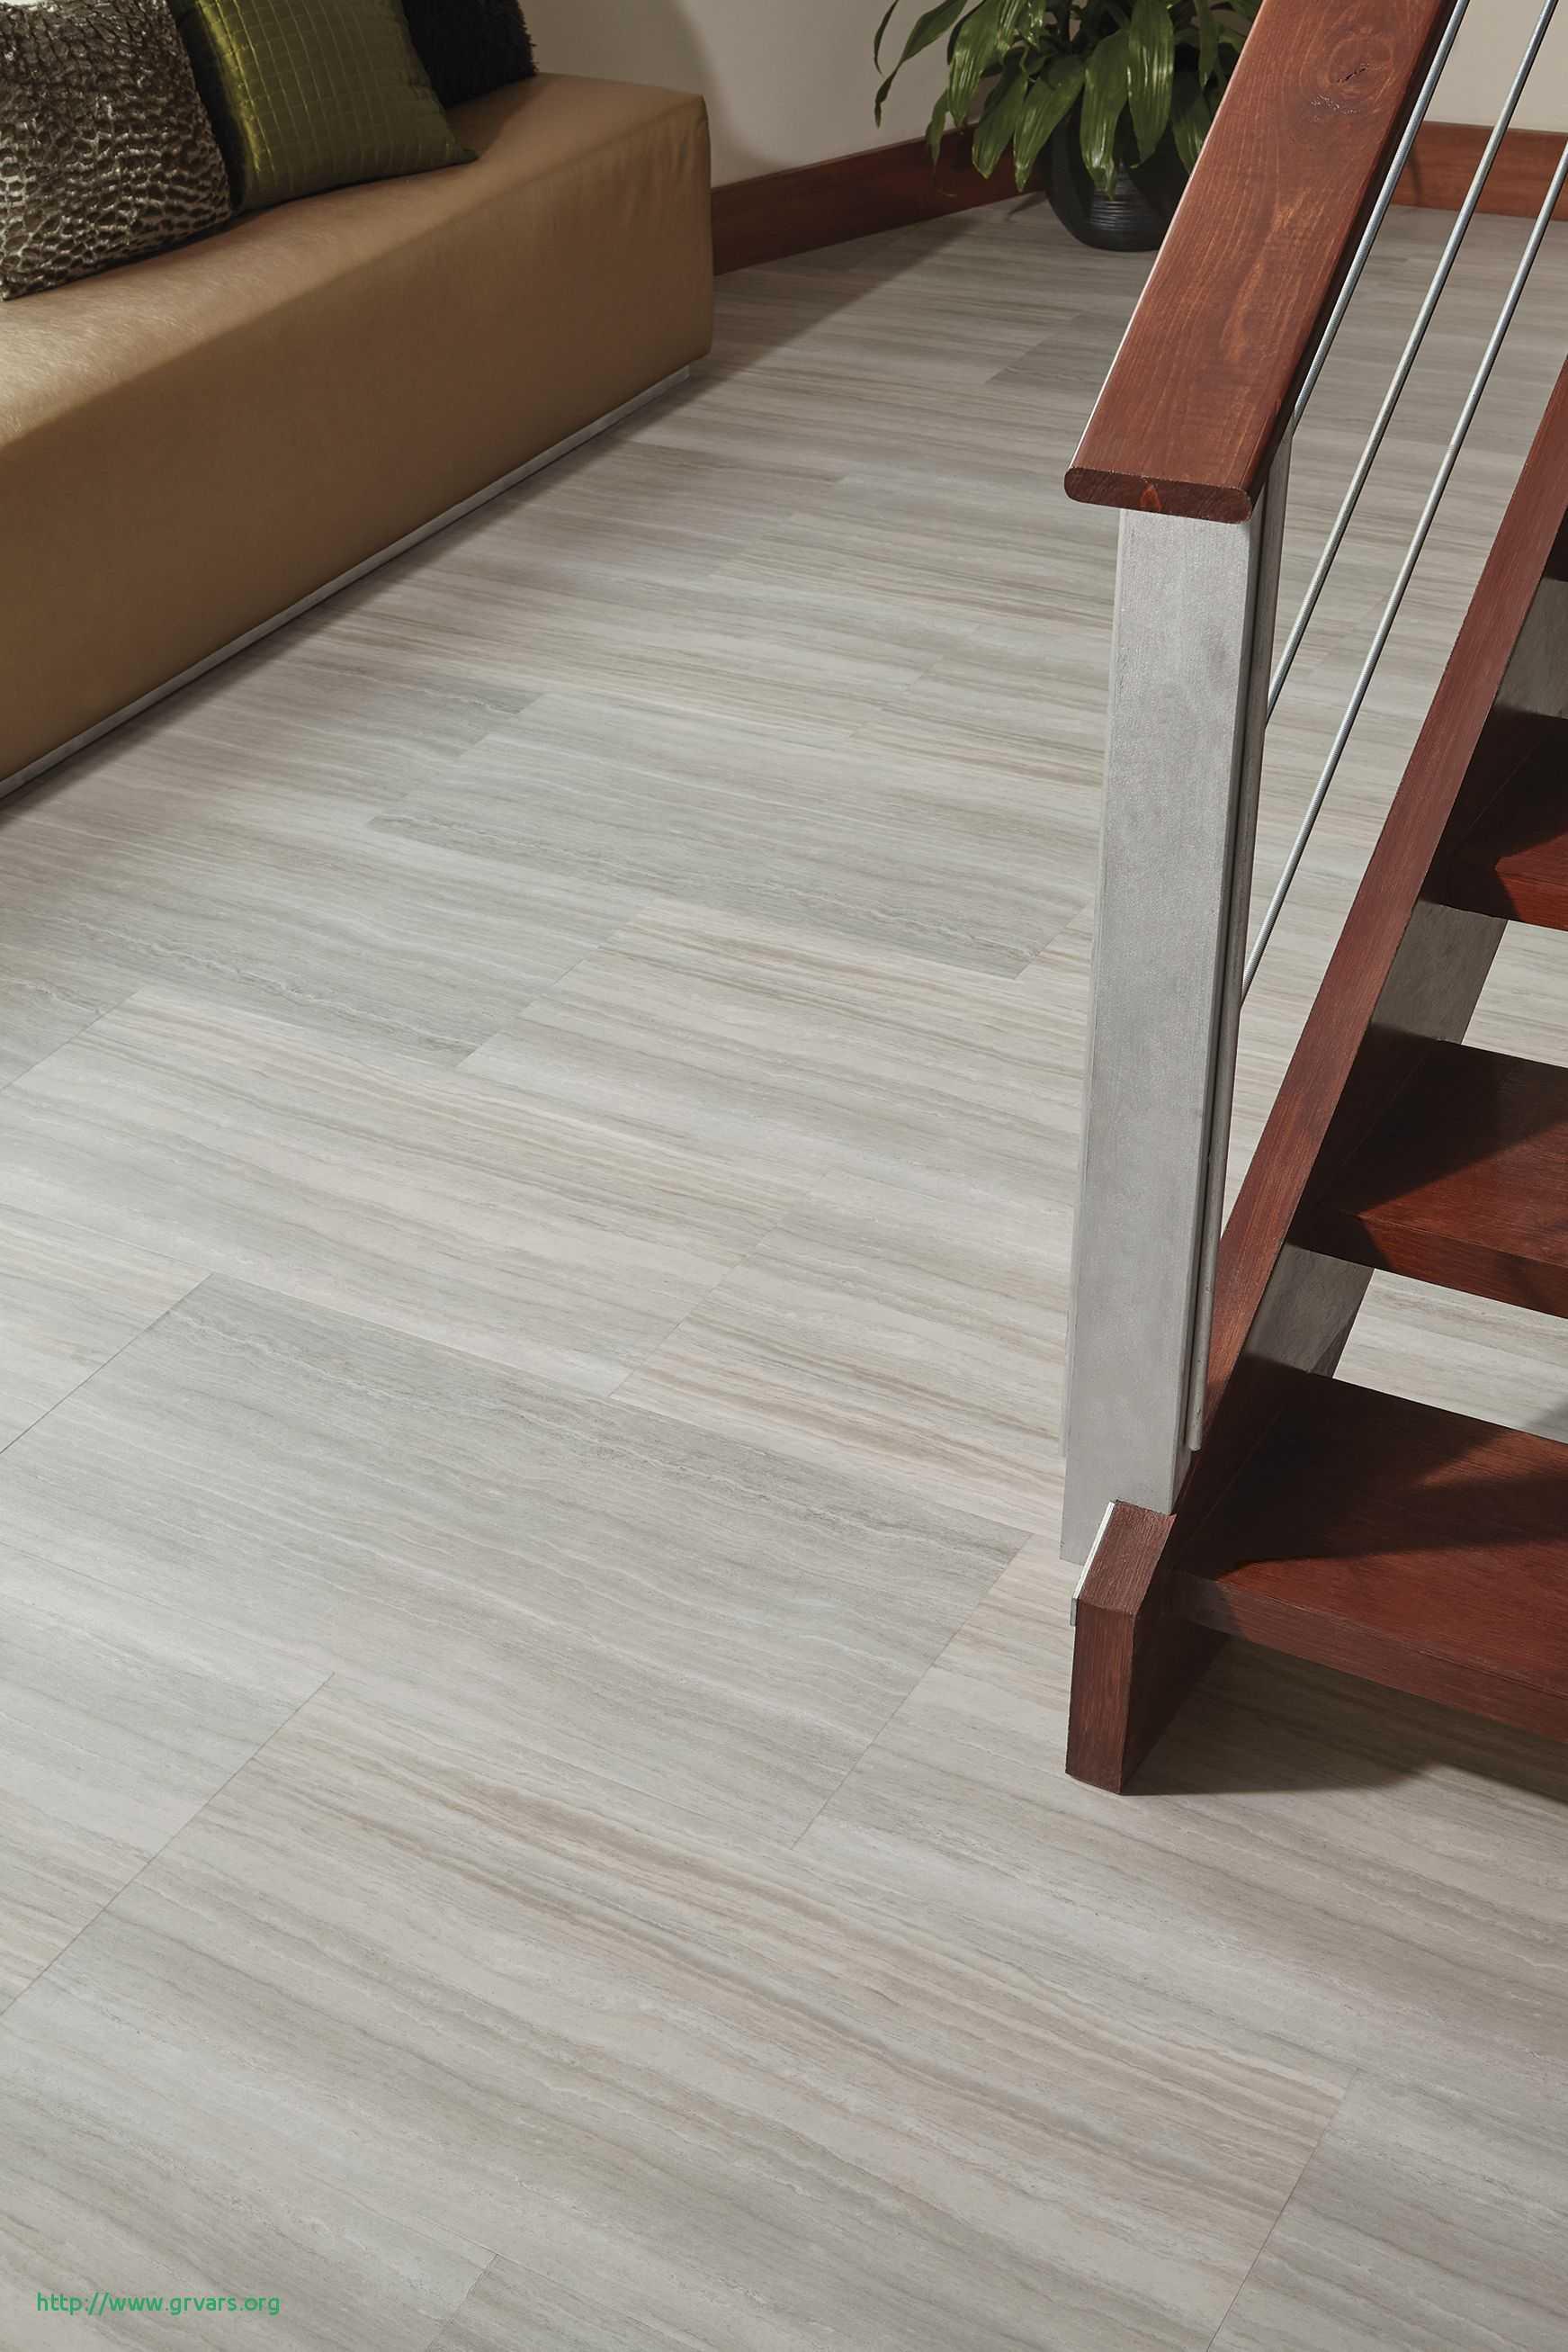 engineered hardwood flooring glue vs float of 20 charmant floting floor ideas blog with regard to floting floor nouveau stainmaster manor travertine 5g floating plank 17 74x 35